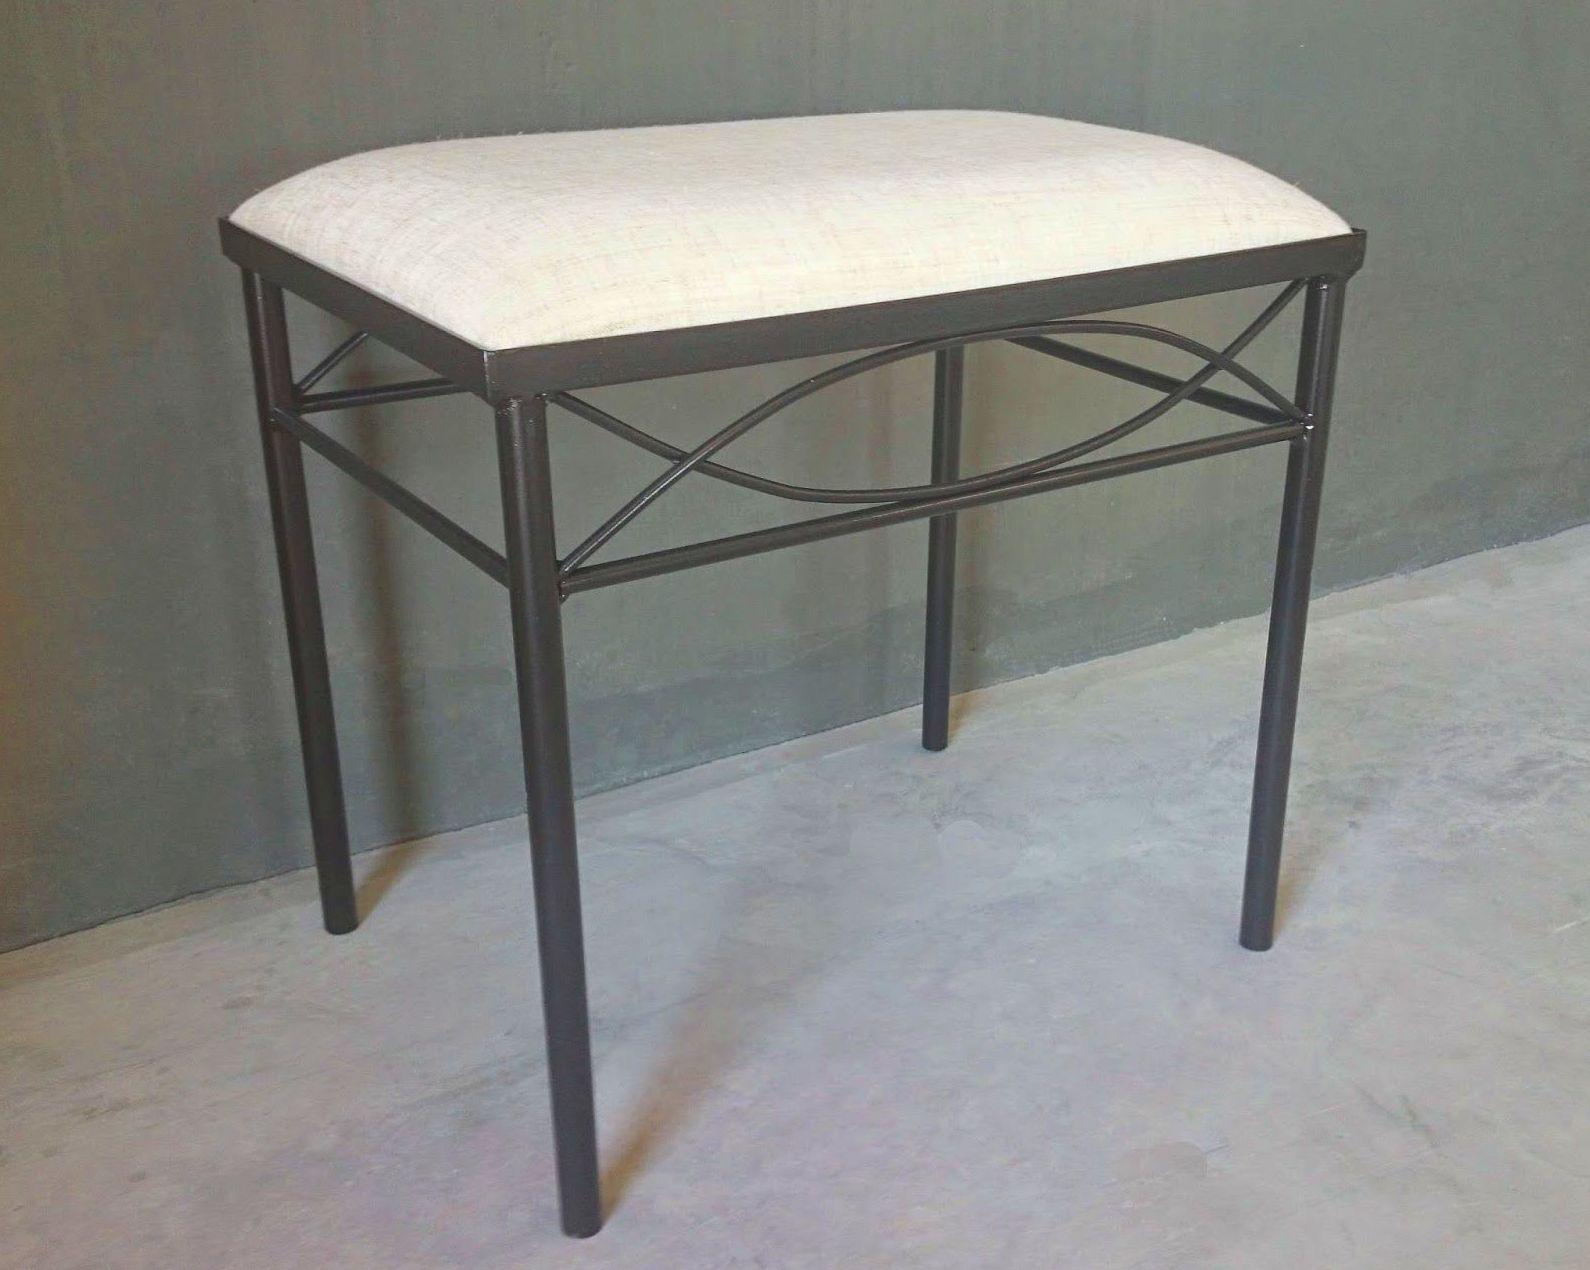 Banqueta Lugo: Catálogo de muebles de forja de Forja Manuel Jiménez